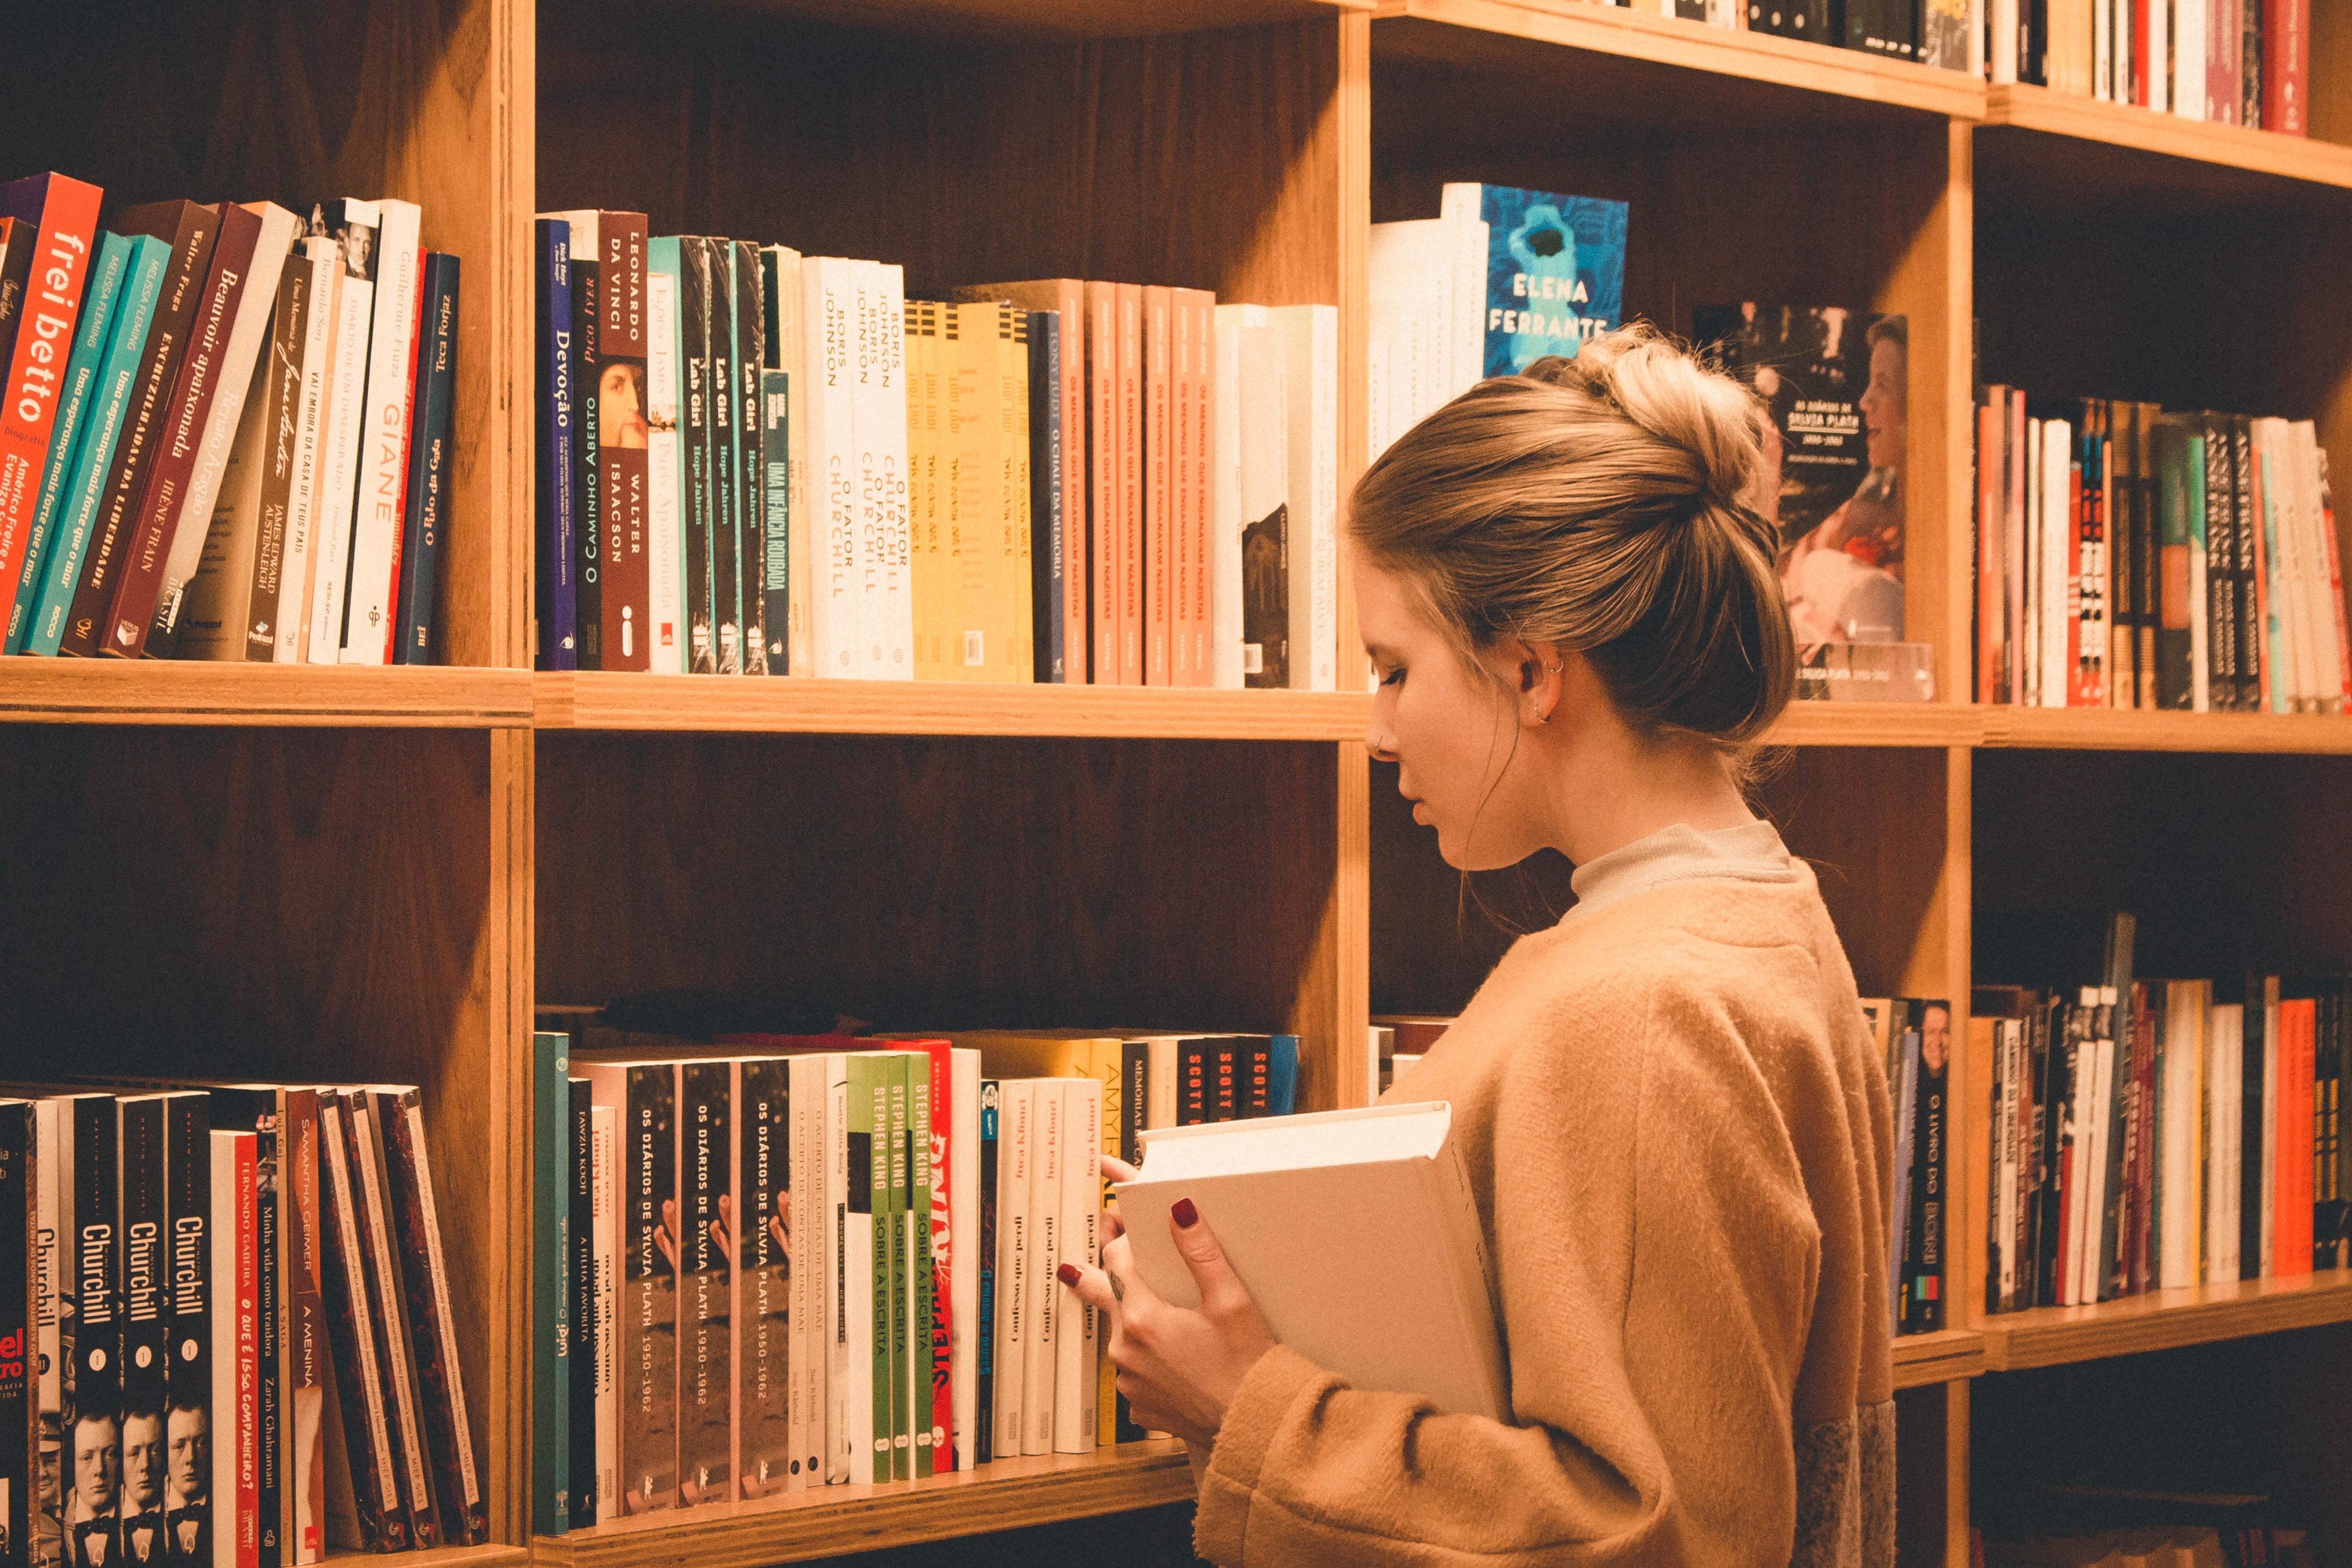 Browisng In A Bookshop